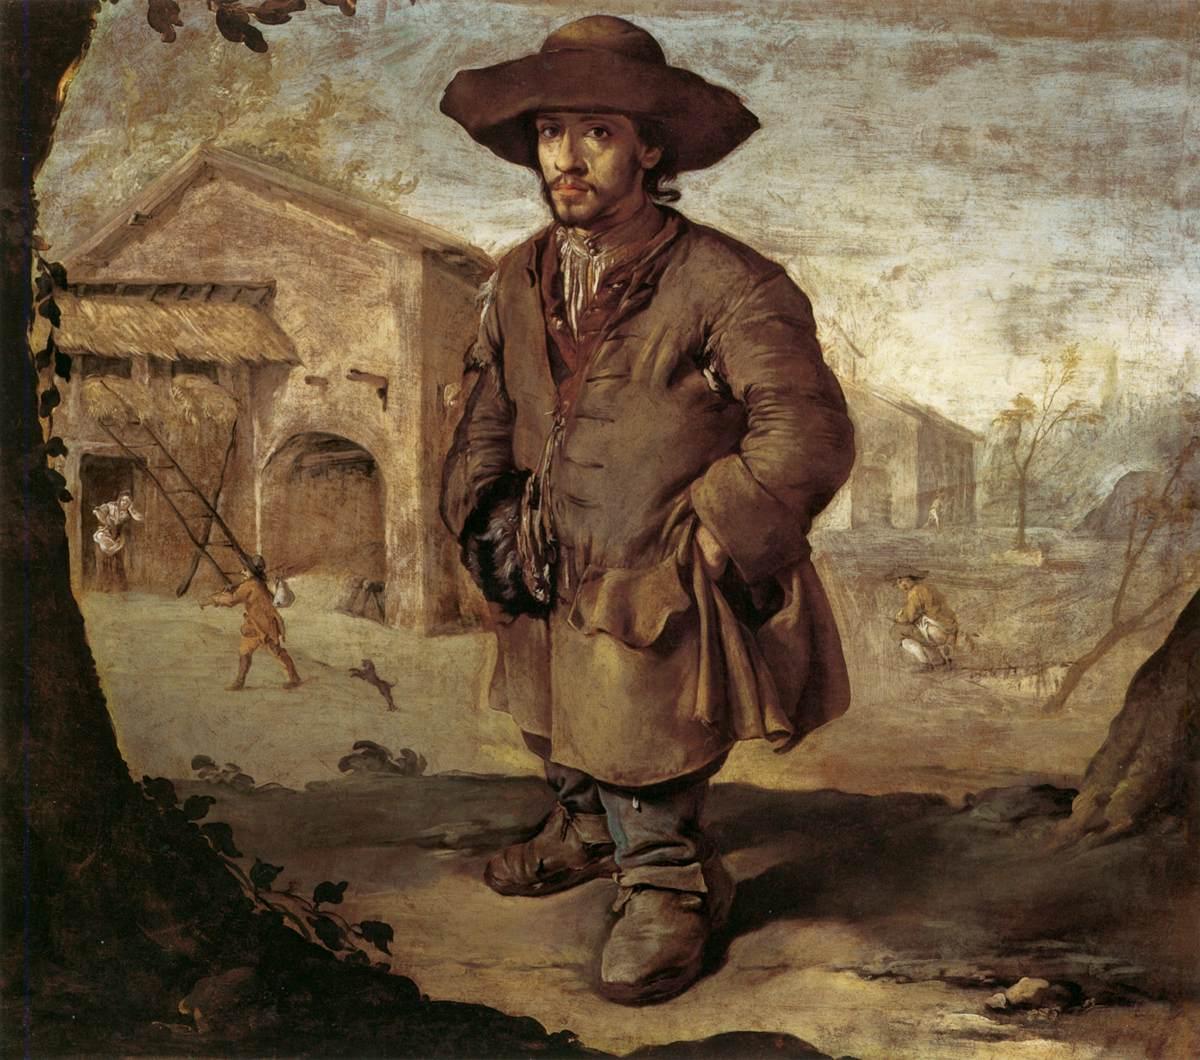 File:Giacomo Ceruti - The Dwarf - WGA4665.jpg - Wikimedia ...